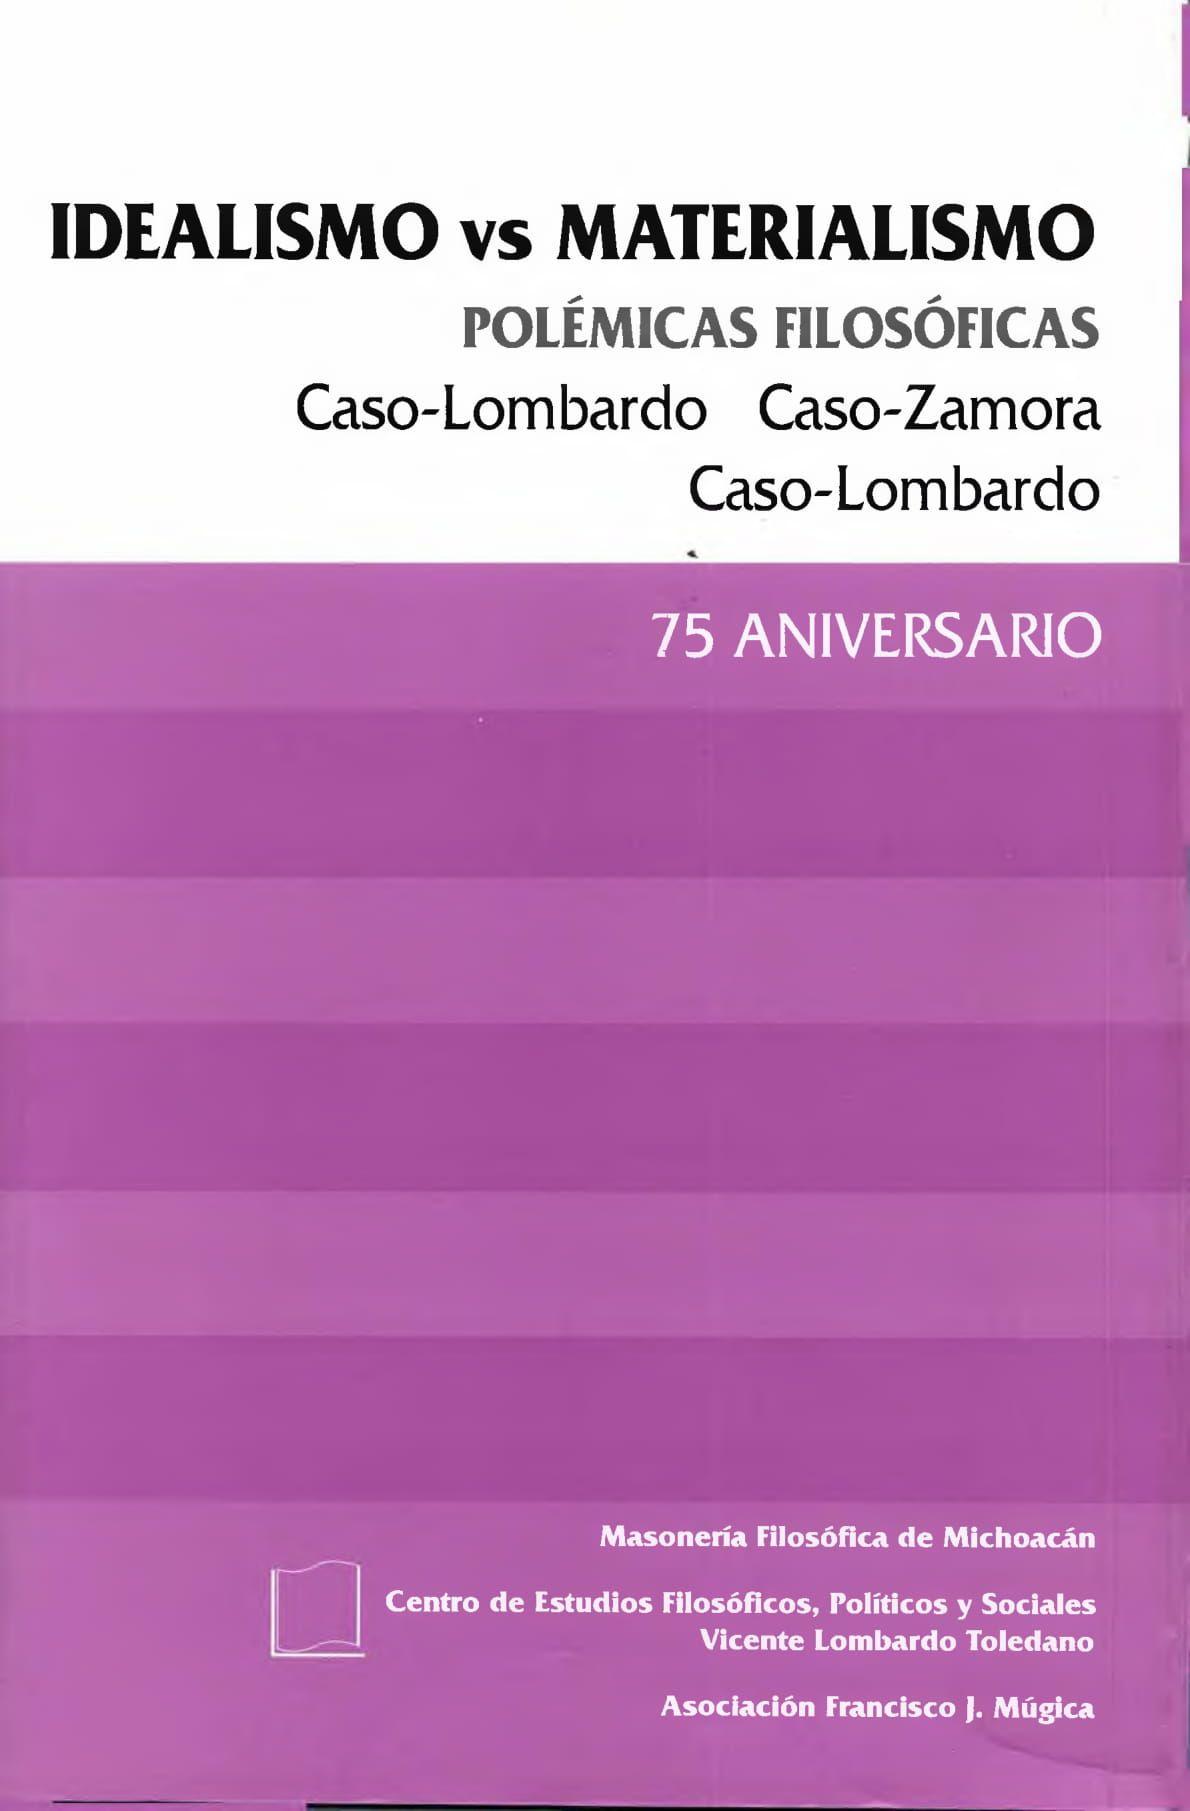 Portada del libro: IDEALISMO VS. MATERIALISMO. POLÉMICAS FILOSÓFICAS CASO-LOMBARDO. CASO-ZAMORA. CASO-LOMBARDO. 75 ANIVERSARIO